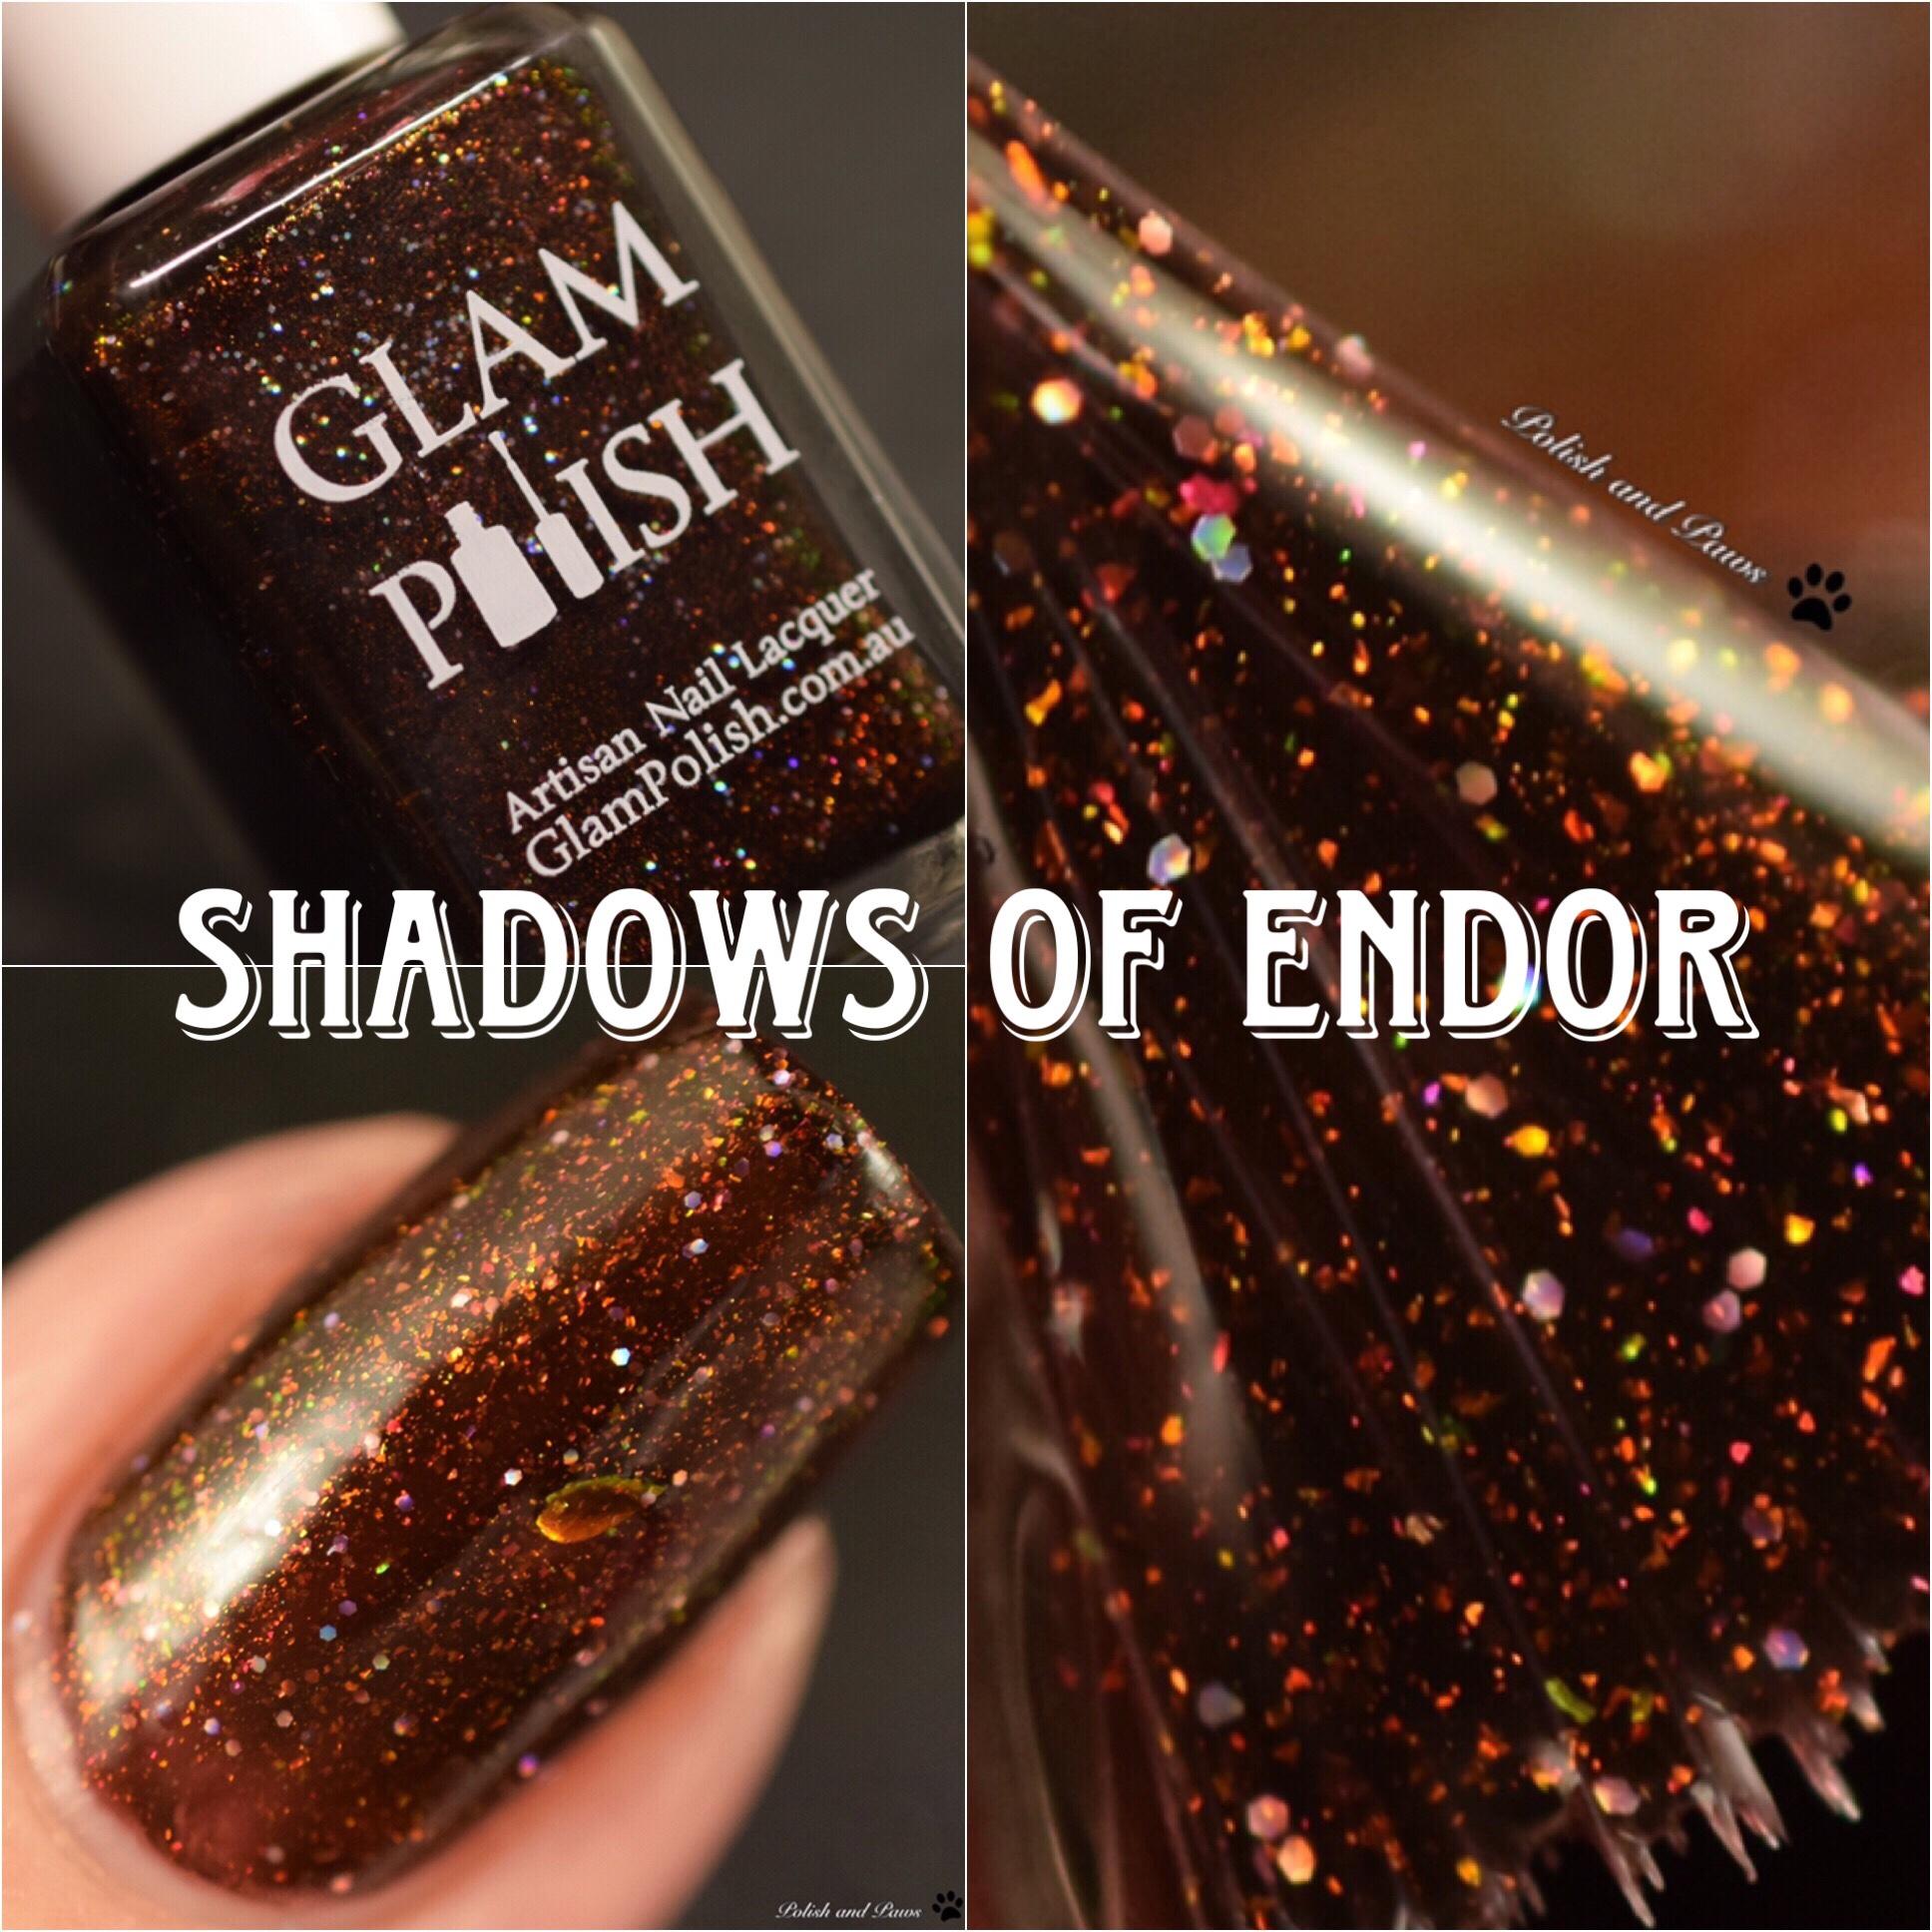 Glam Polish Shadows of Endor